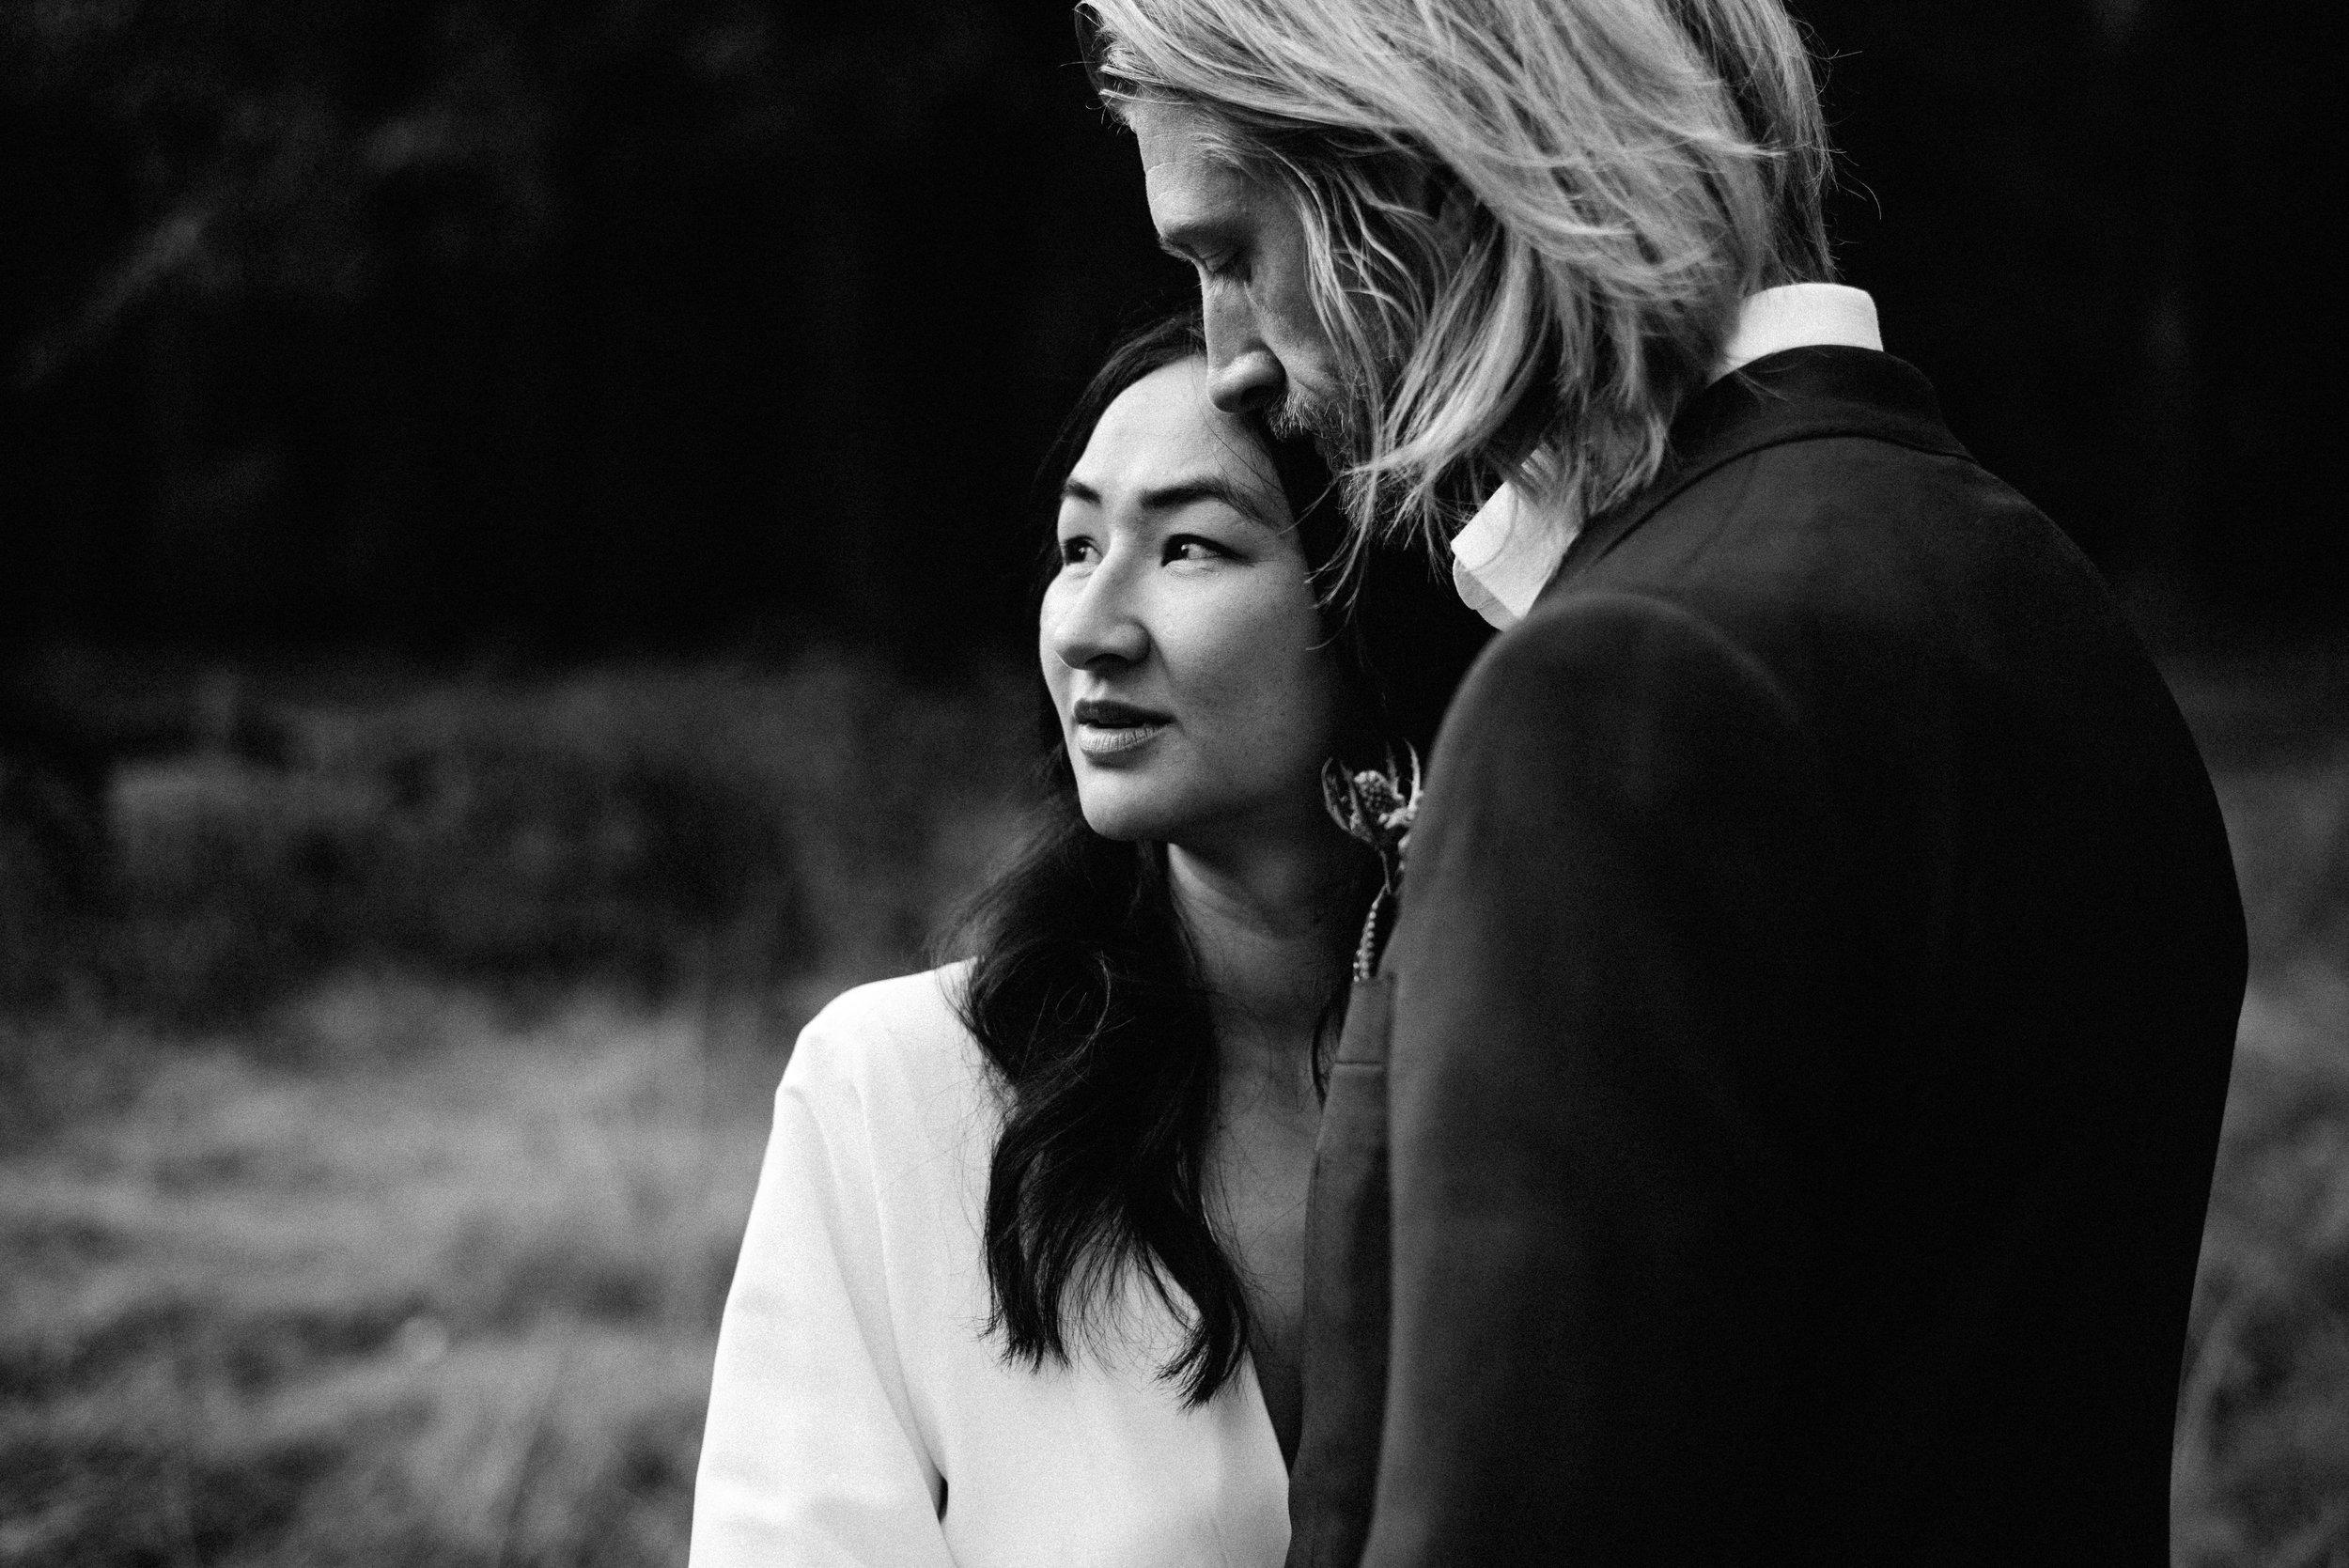 yosemite-wedding-dana-sean-79.jpg